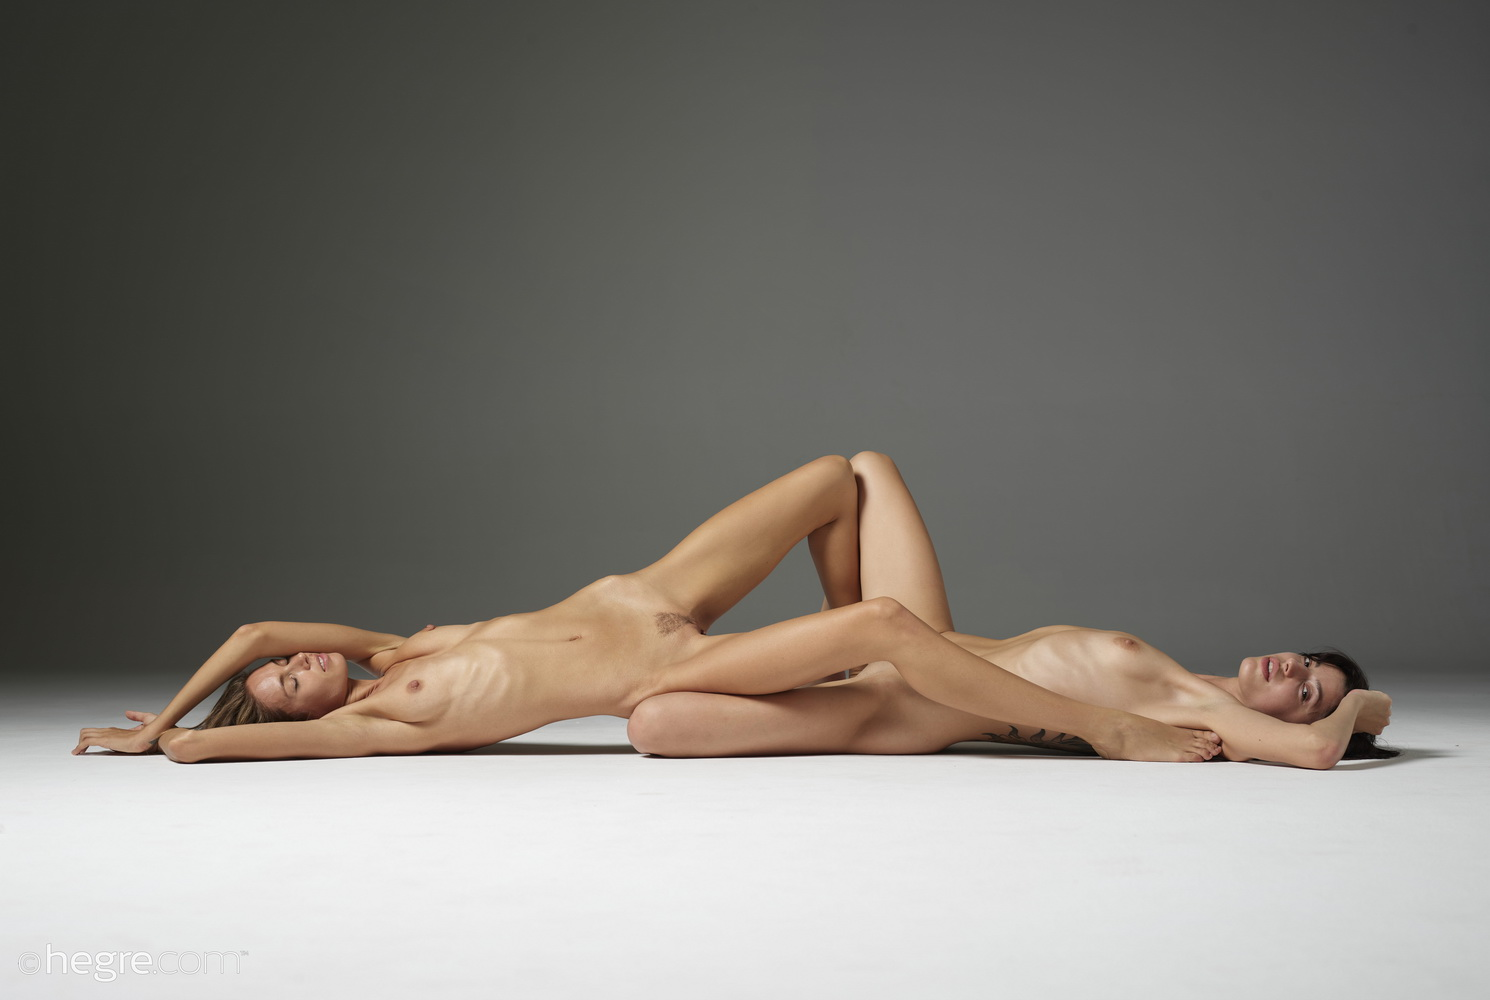 [Hegre-Art] Alya & Oksi - Duo Nudes 39 Photos ( January 12th 2020) - 貼圖 - 歐美寫真 -